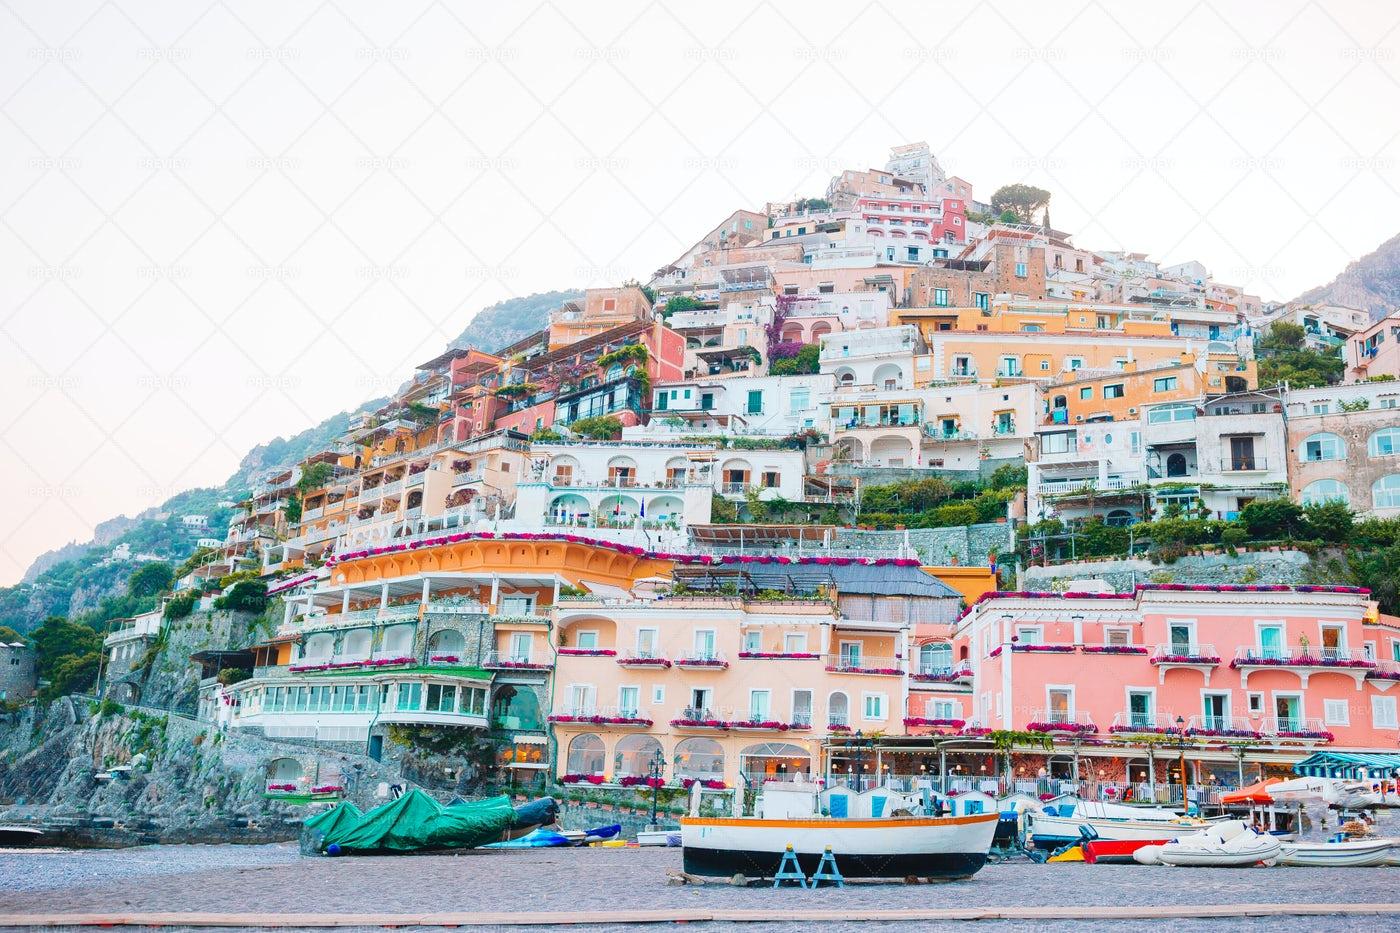 Positano, Italy: Stock Photos